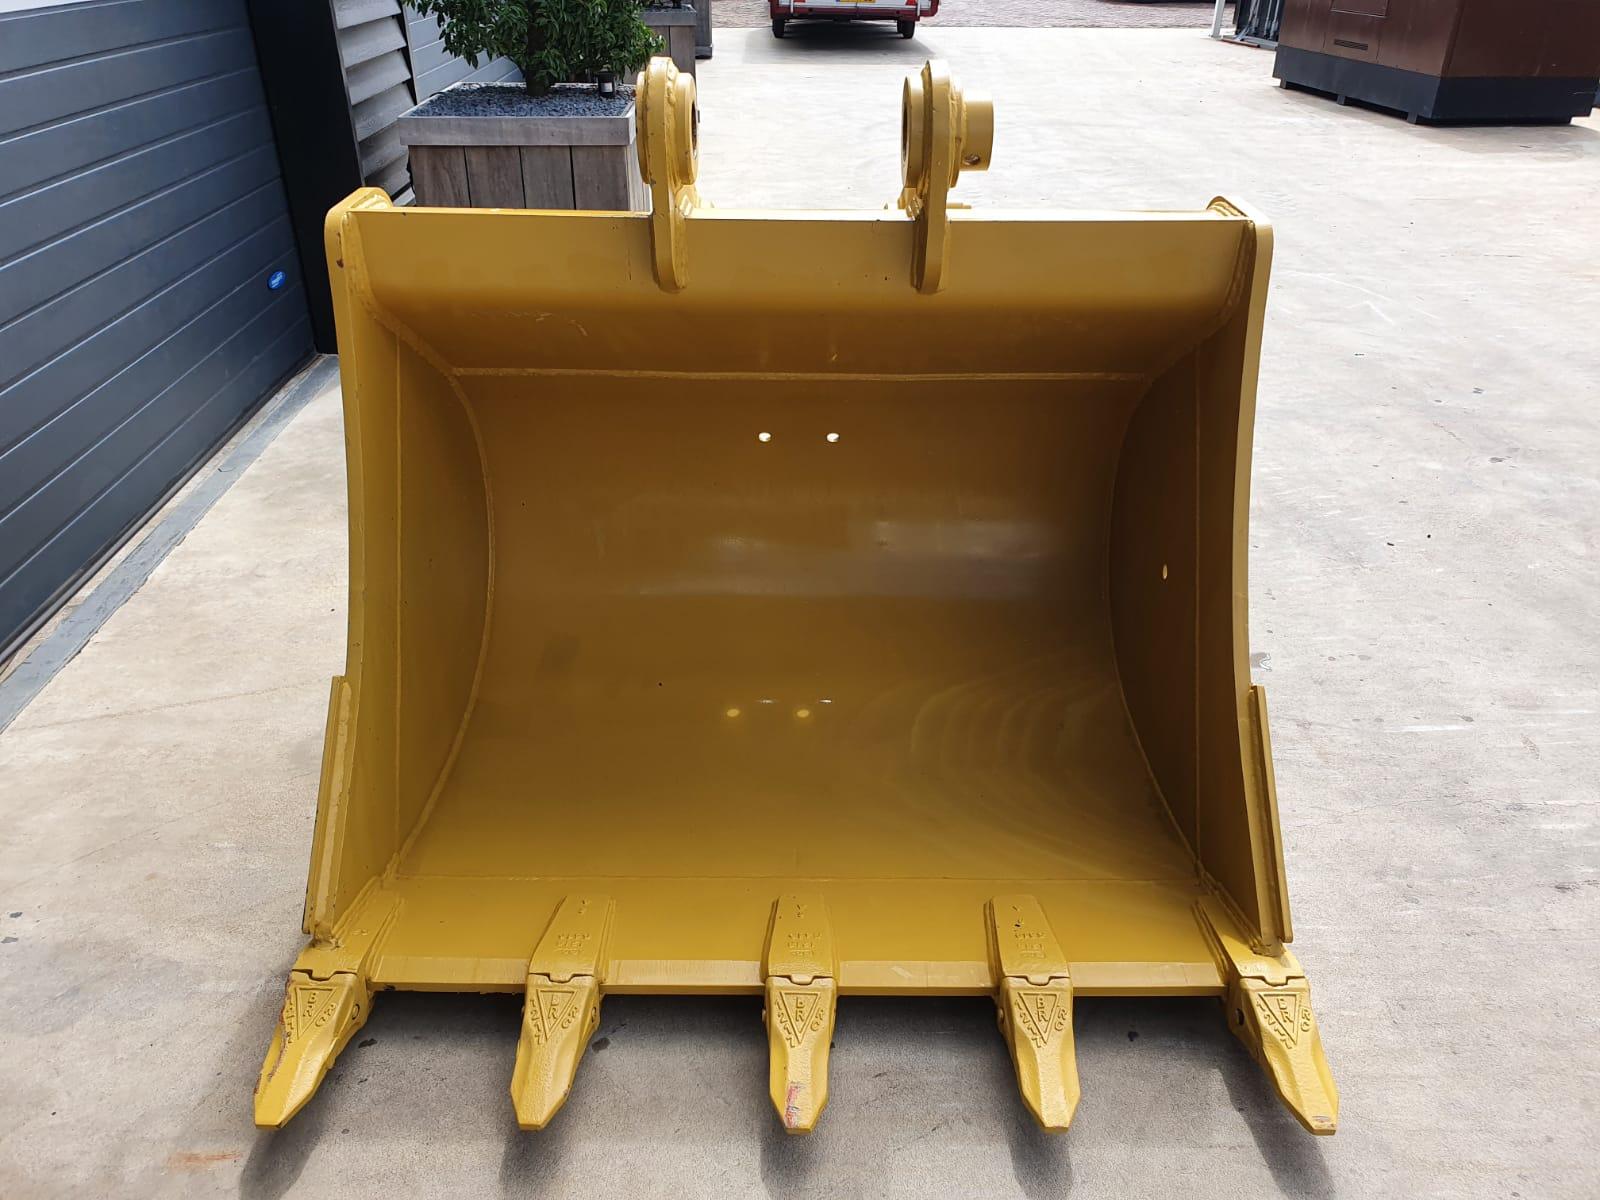 Bucket for Caterpillar 320